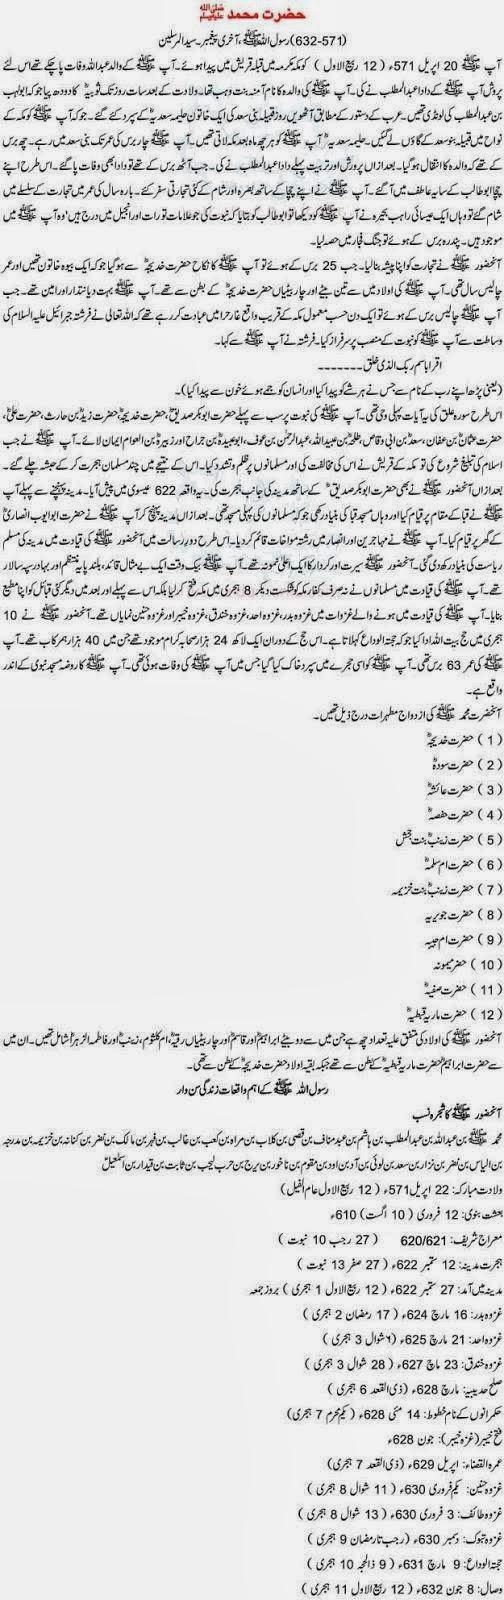 it ilm com news entertainment tips health tips islamic  hazrat muhammad p b u h life history in urdu prophet muhammad p b u h history in urdu hazrat muhammad p b u h history hazrat muhammad p b u h life